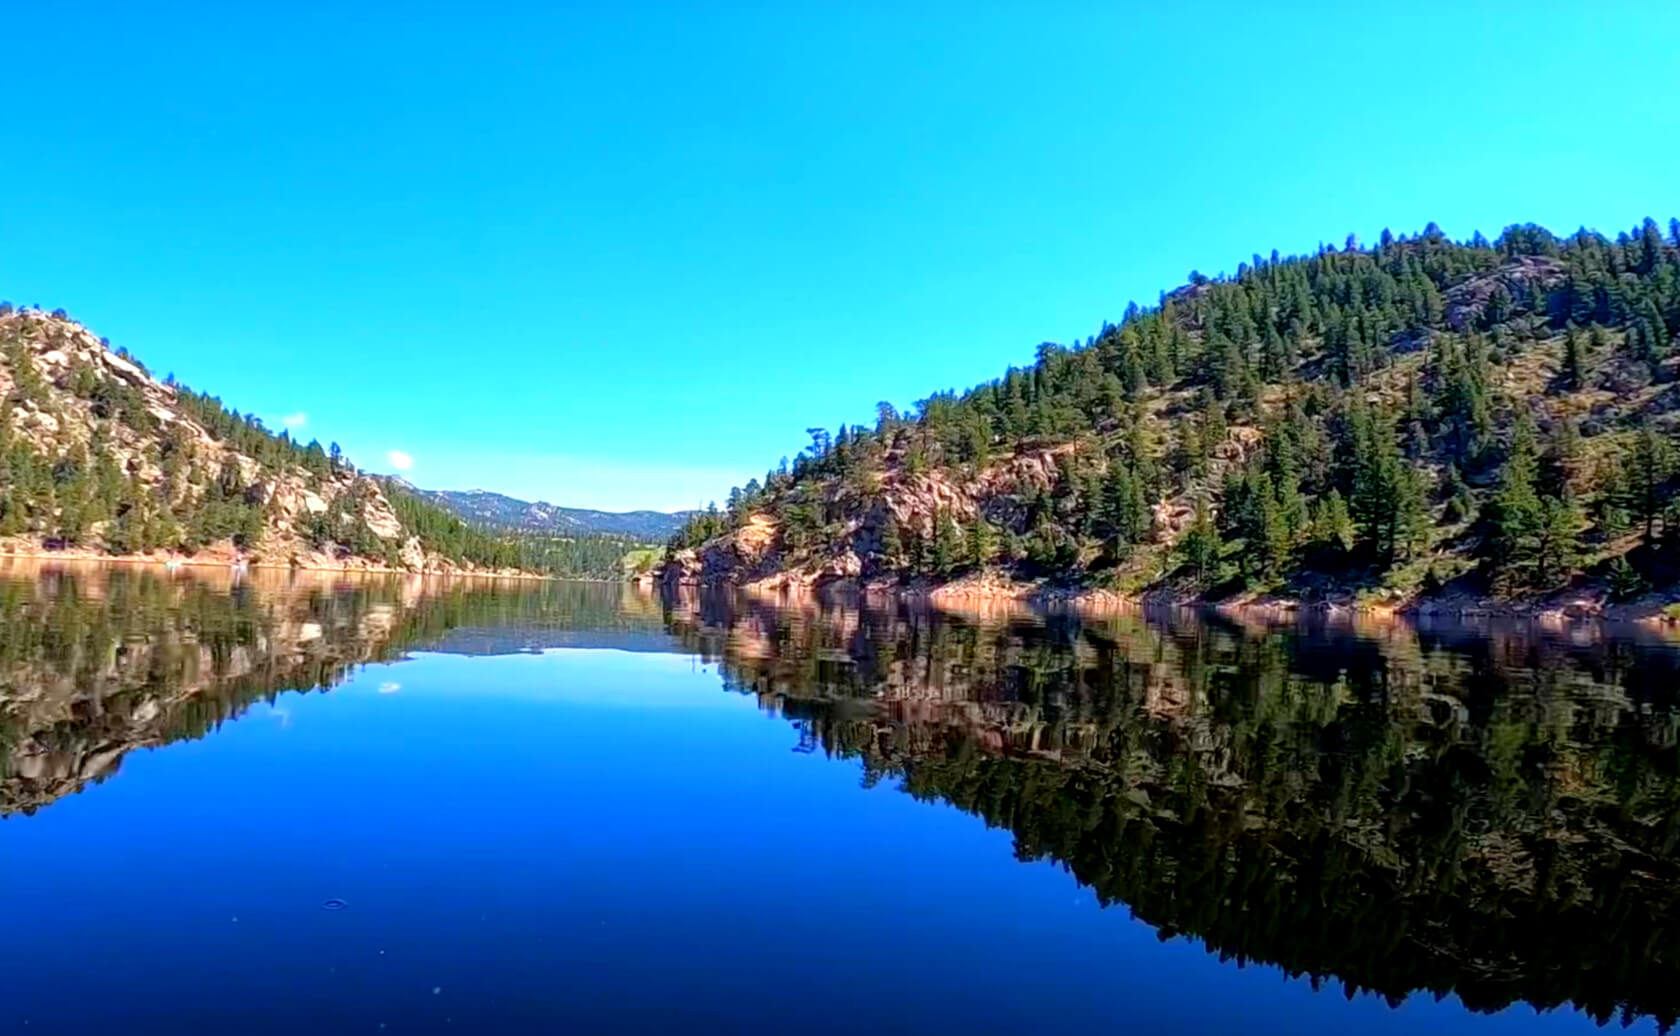 Gross-Lake-Fishing-Guide-Report-Colorado-06